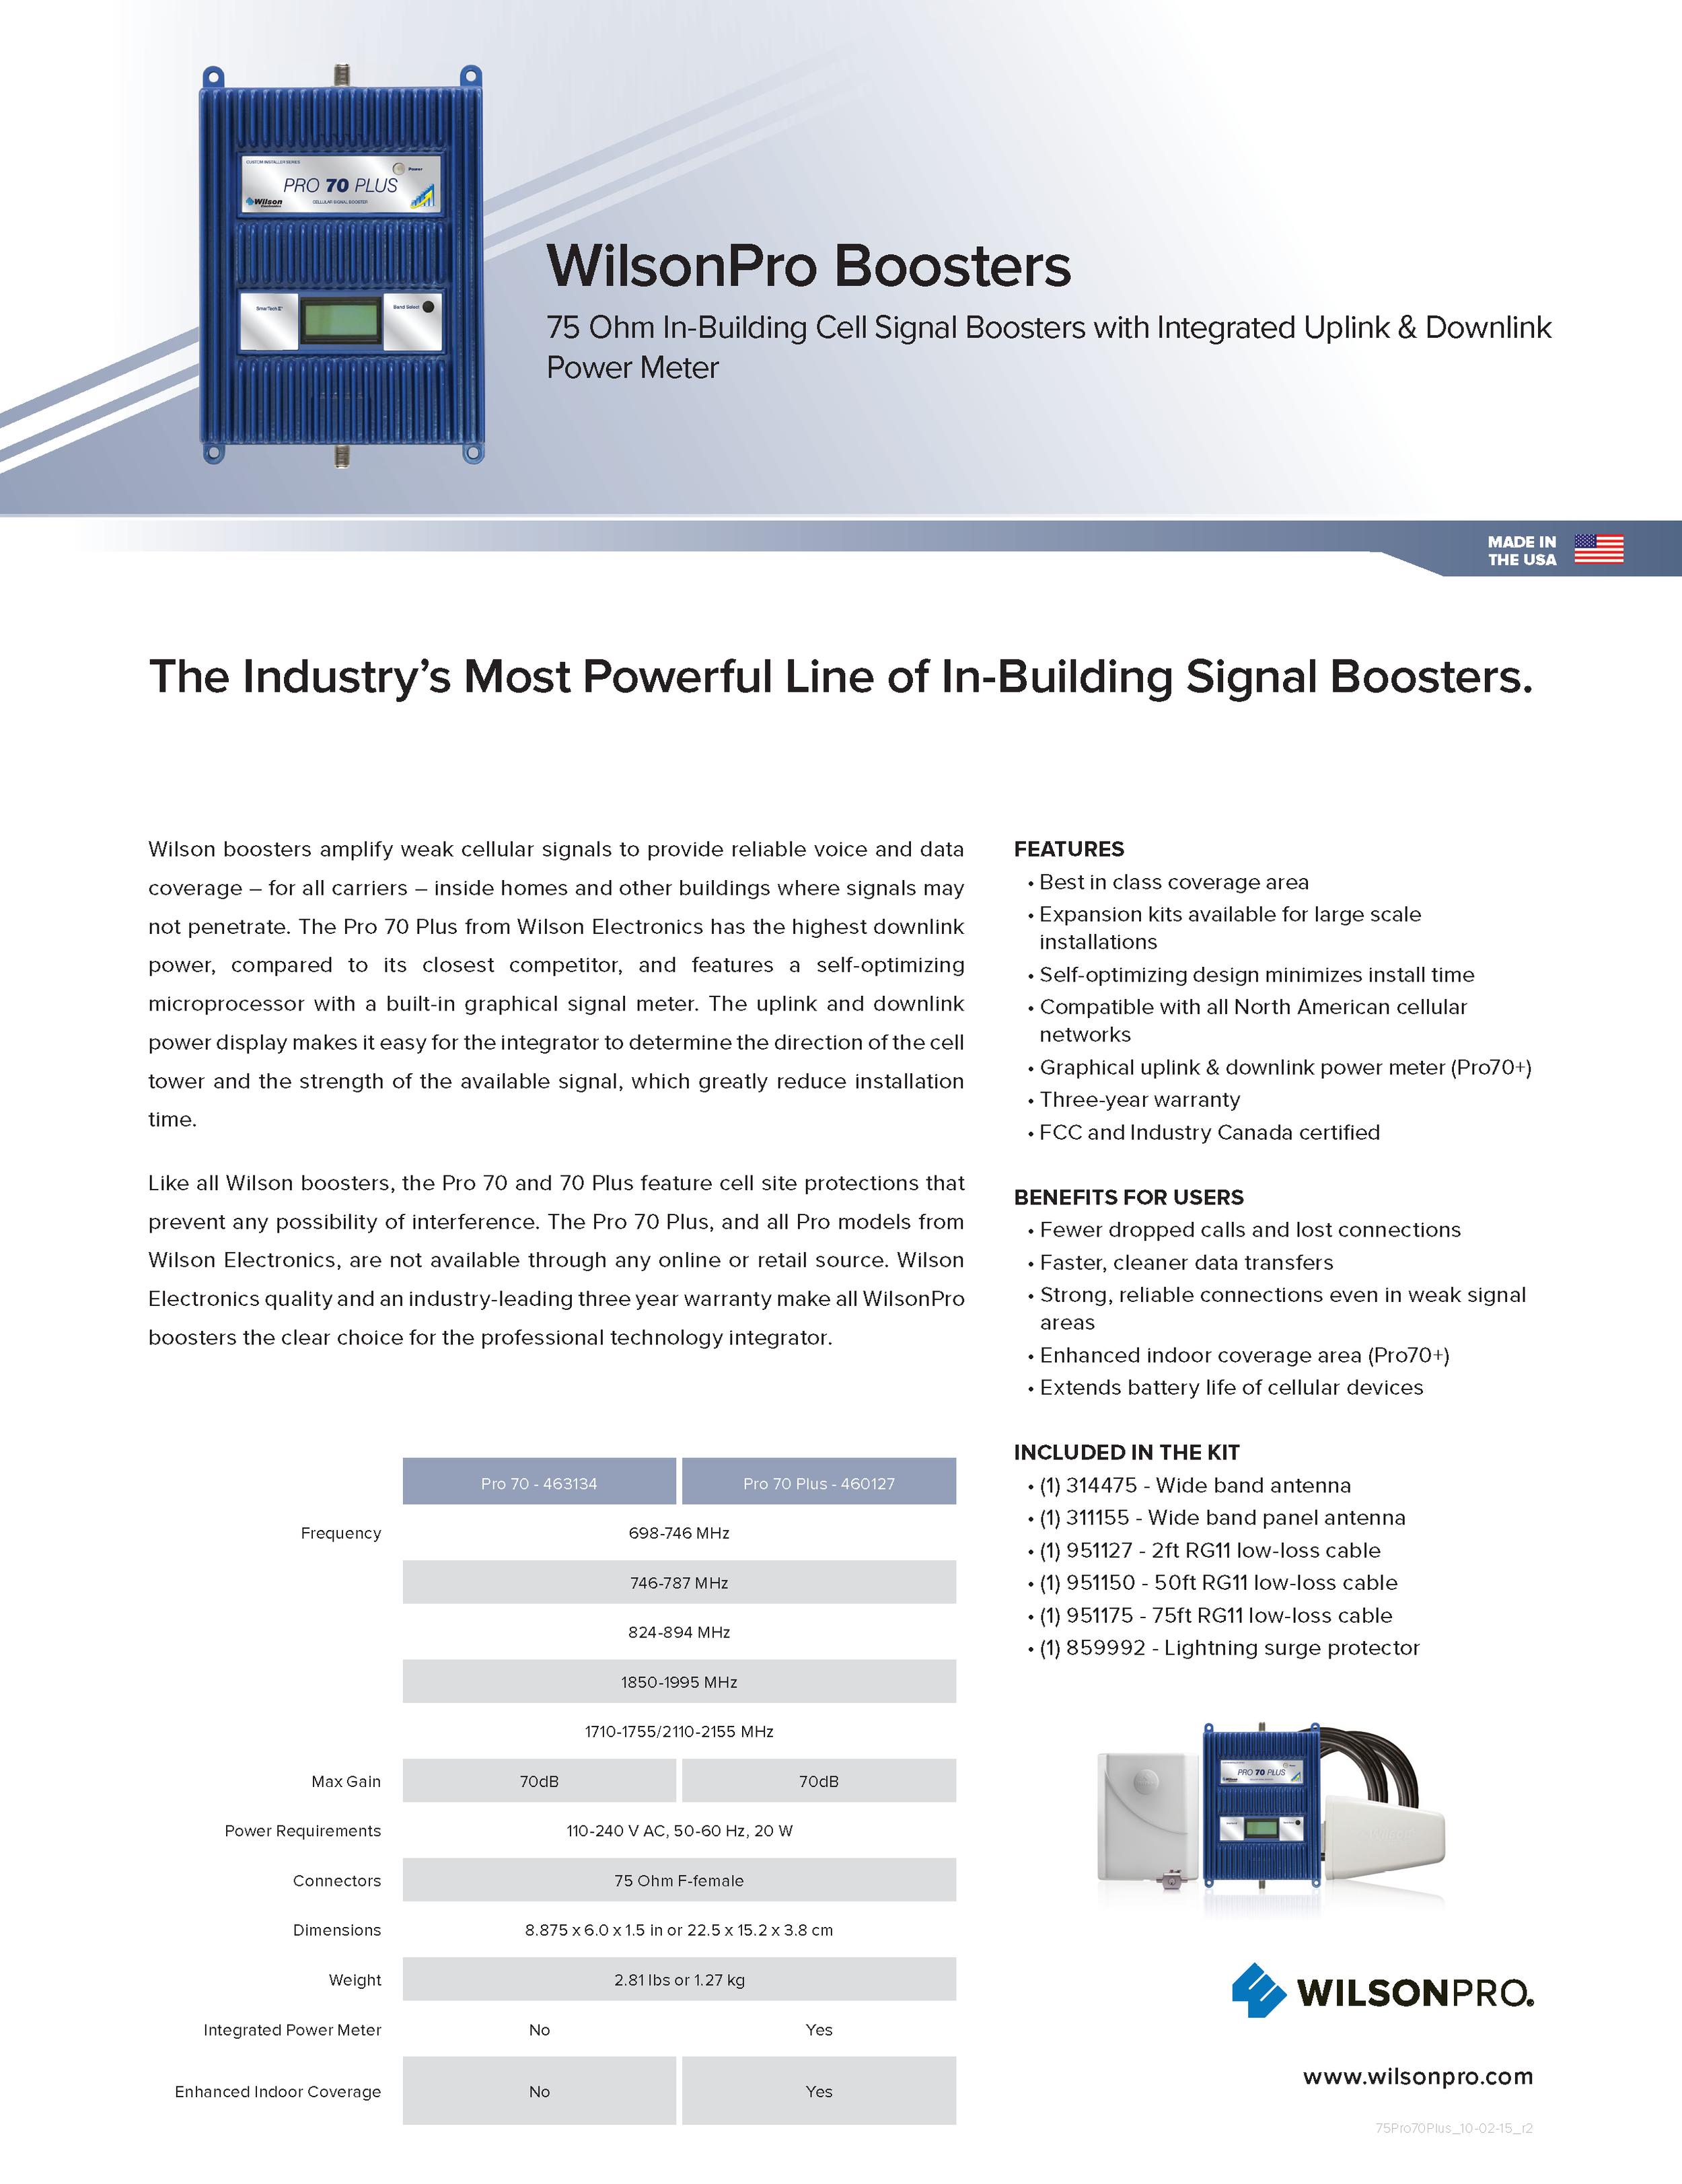 WilsonPro_Pro70_75ohm_Spec_Sheet.png